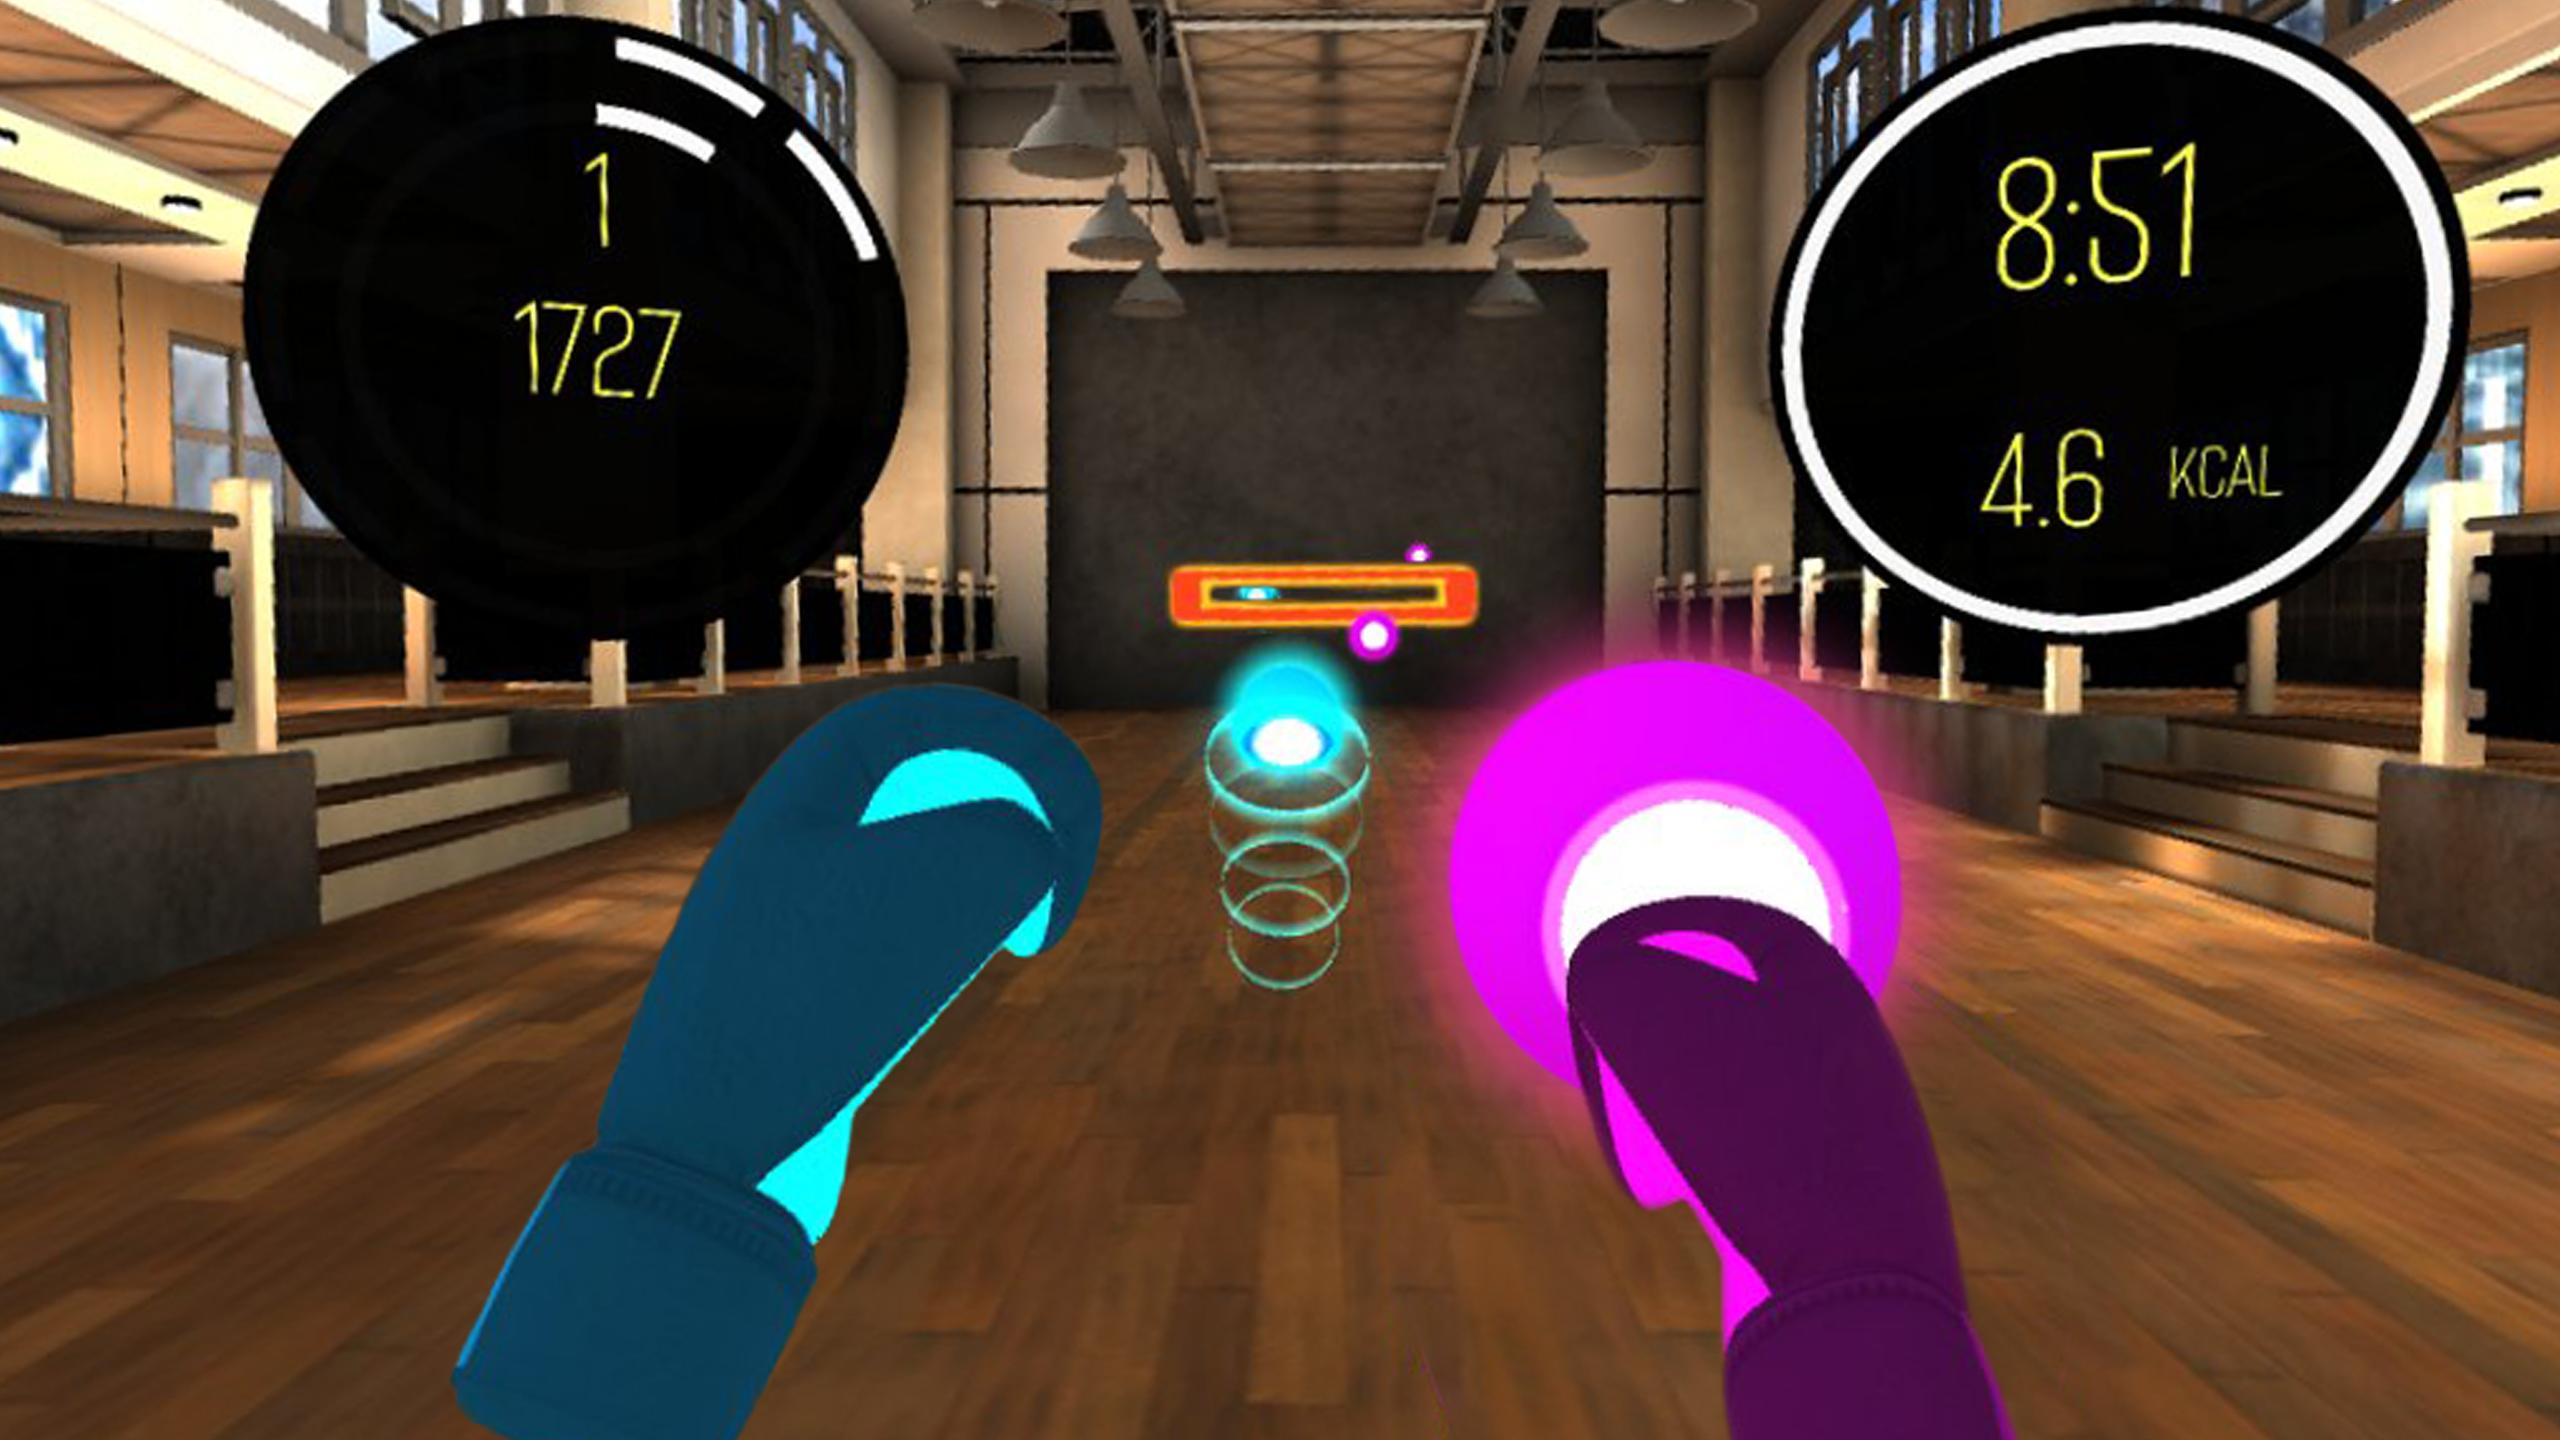 vs9aQxjLJzxvKF4zhbXXVA - Can you get fit in virtual reality?